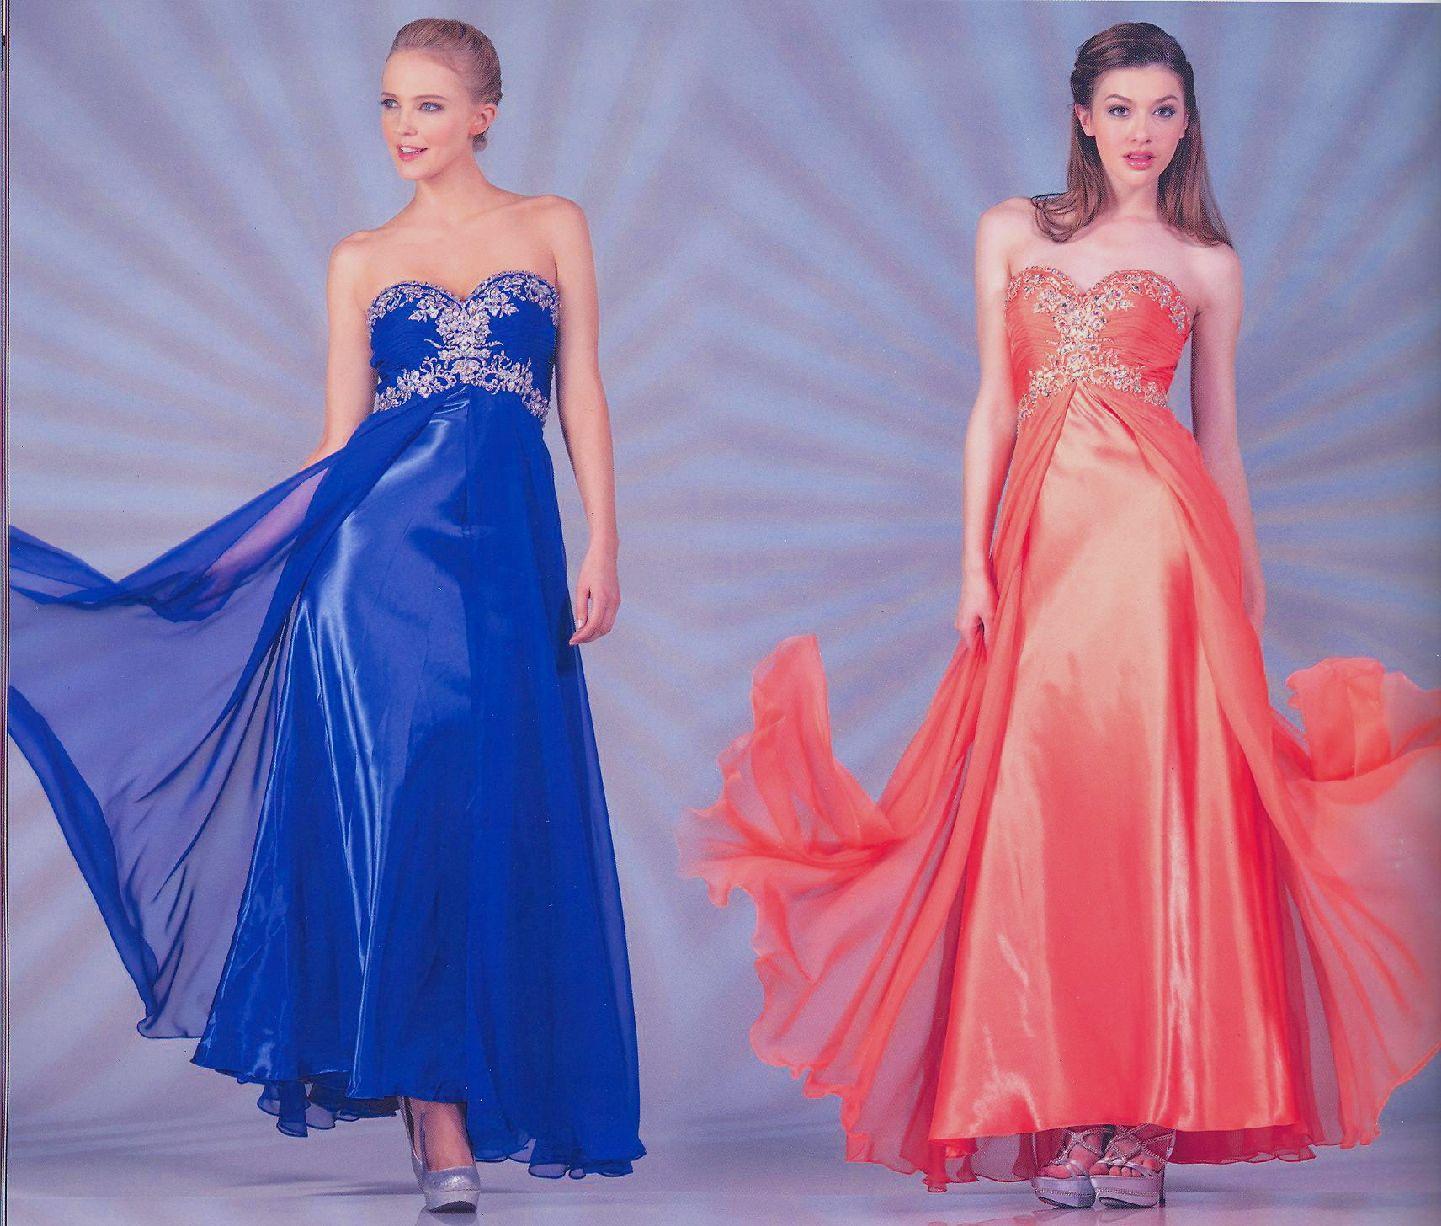 Prom DressEvening Dress under $160jc821Look Amazing!